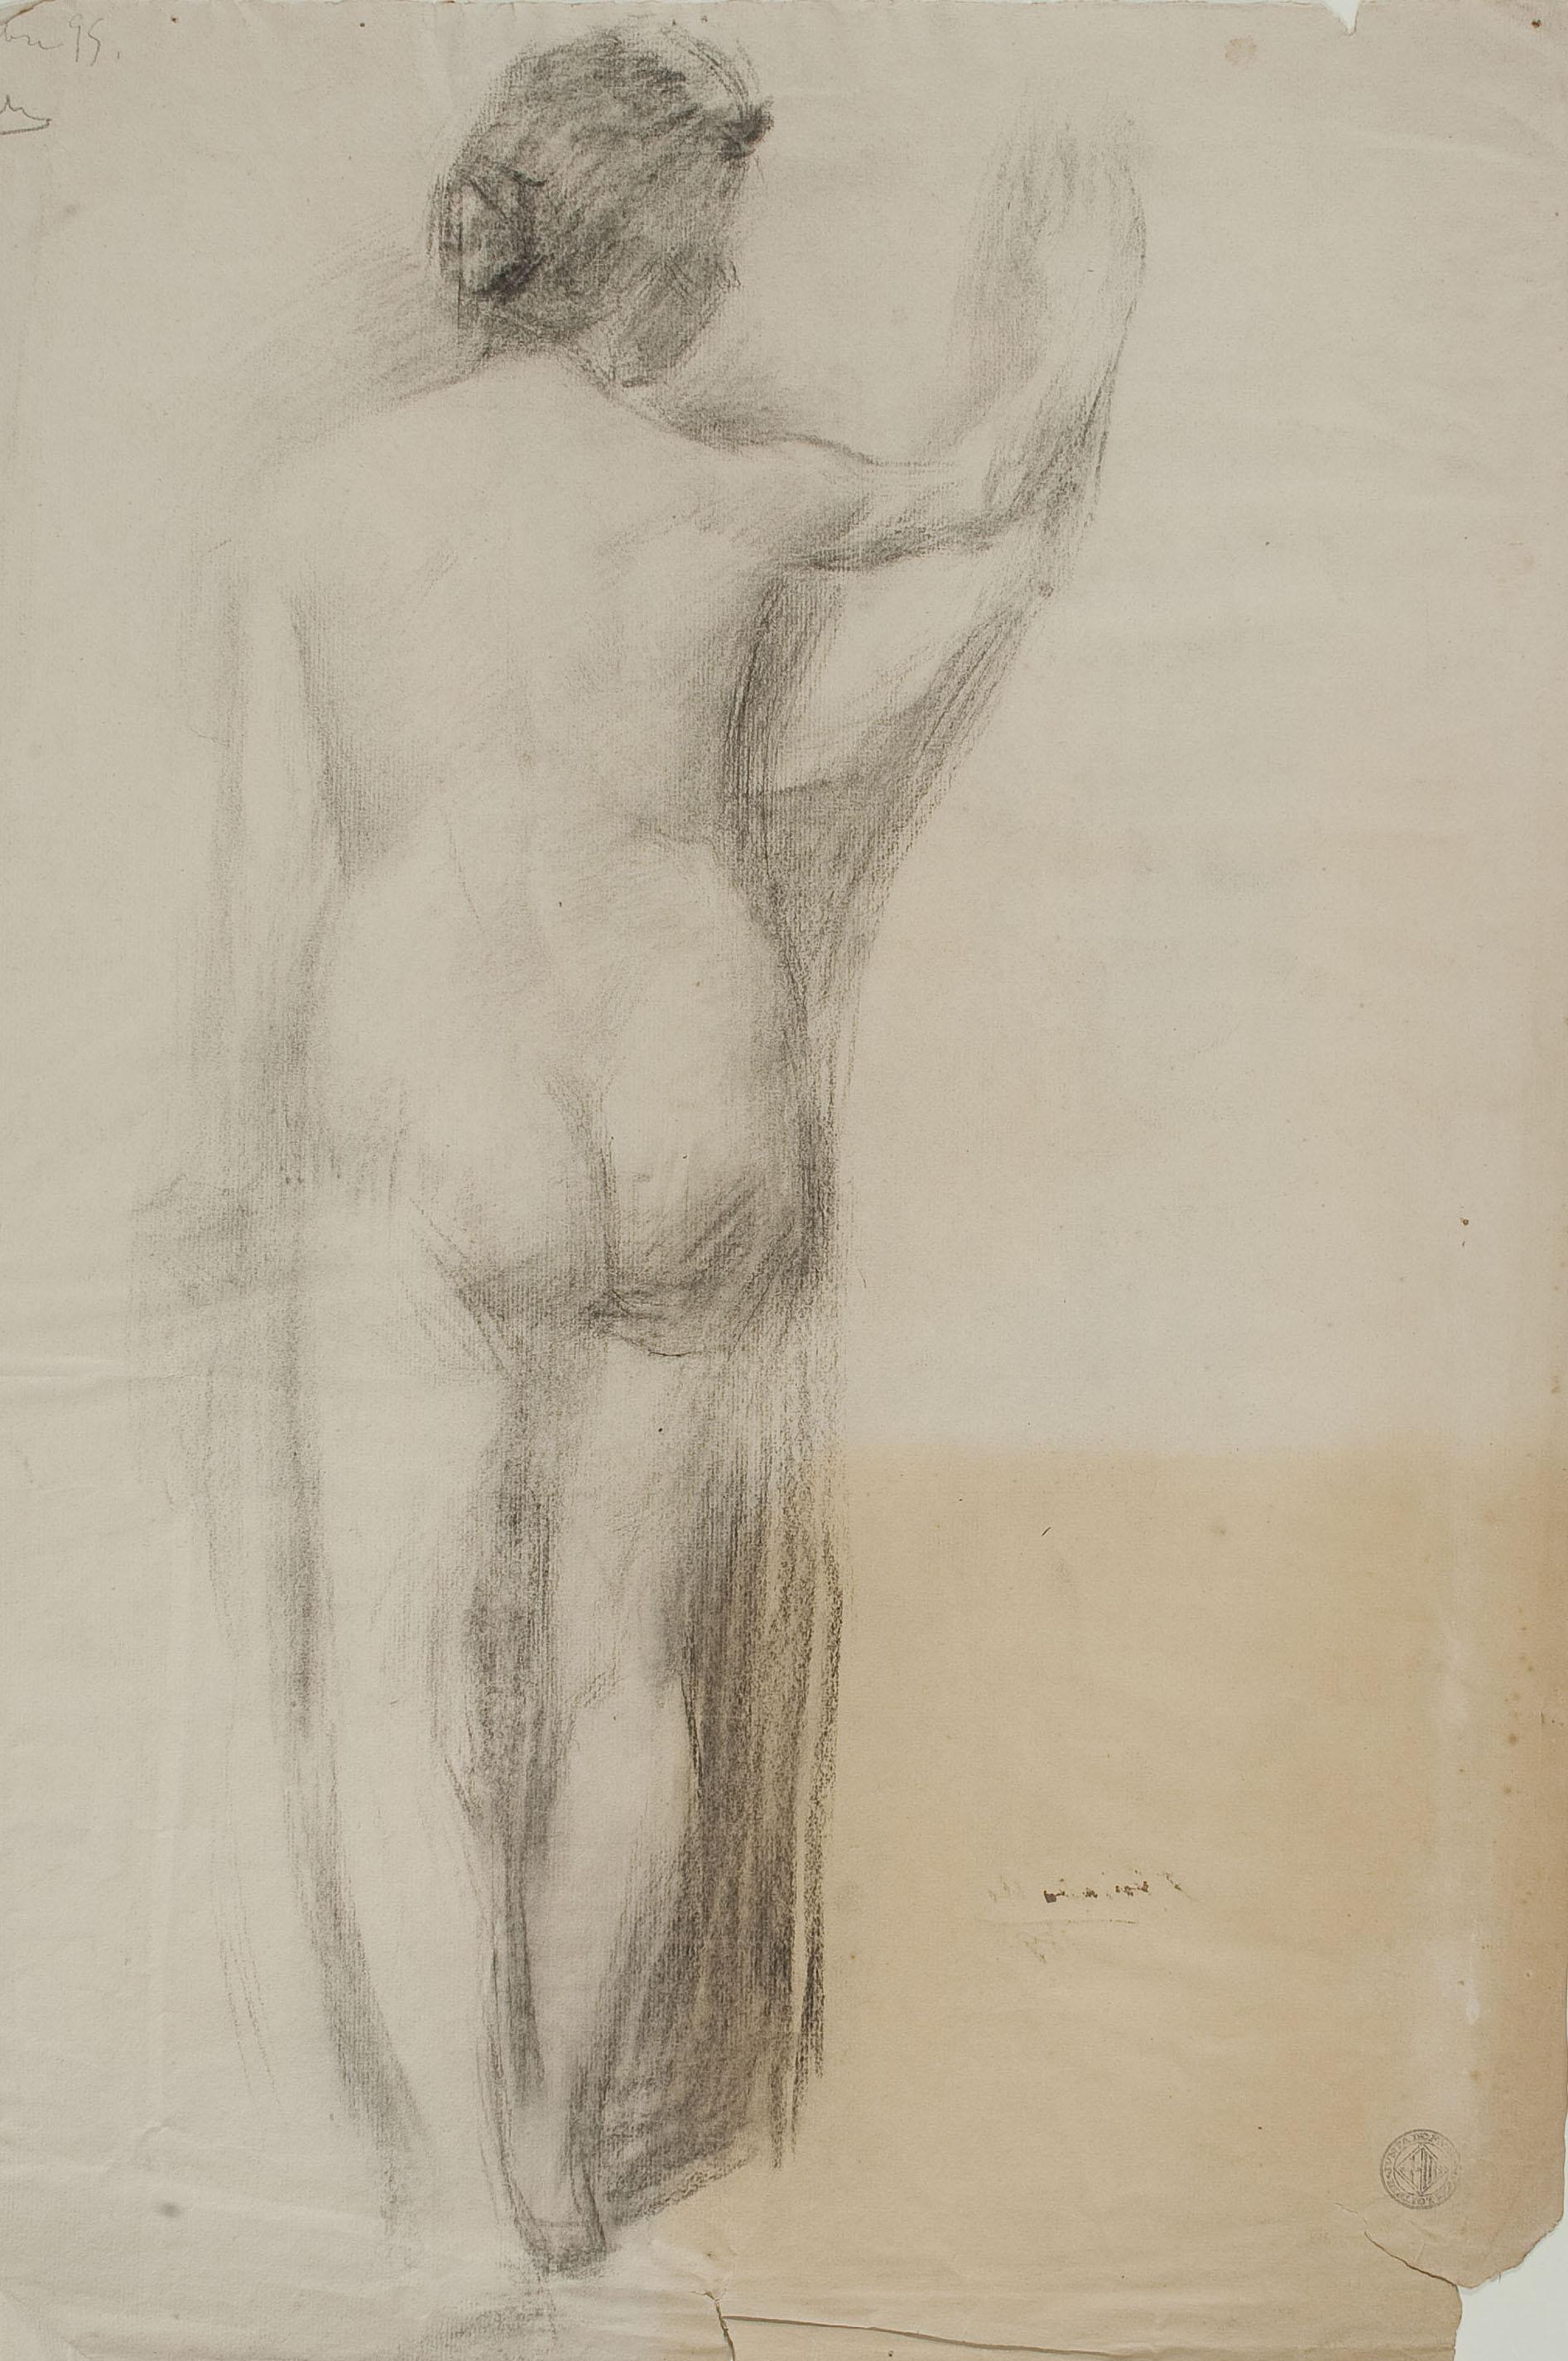 Josep Triadó - Nu masculí (anvers) / Nu femení d'esquena (revers) - 1896 [1]